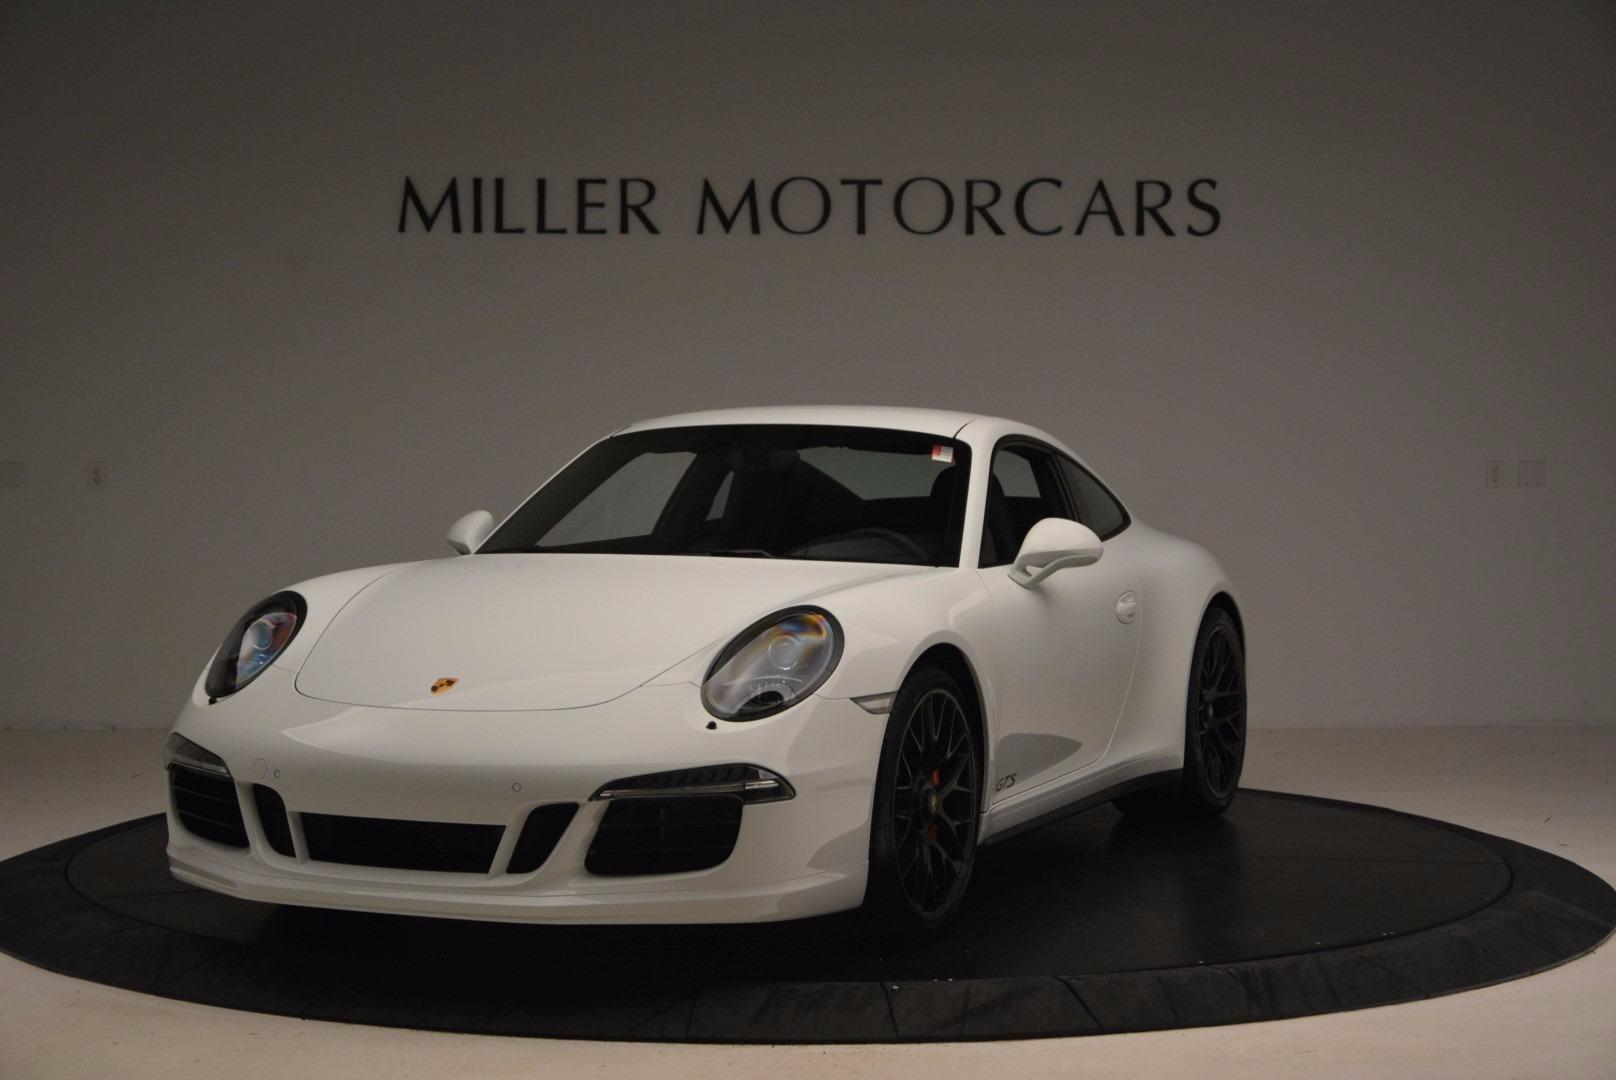 Used 2015 Porsche 911 Carrera GTS For Sale In Greenwich, CT 1444_main